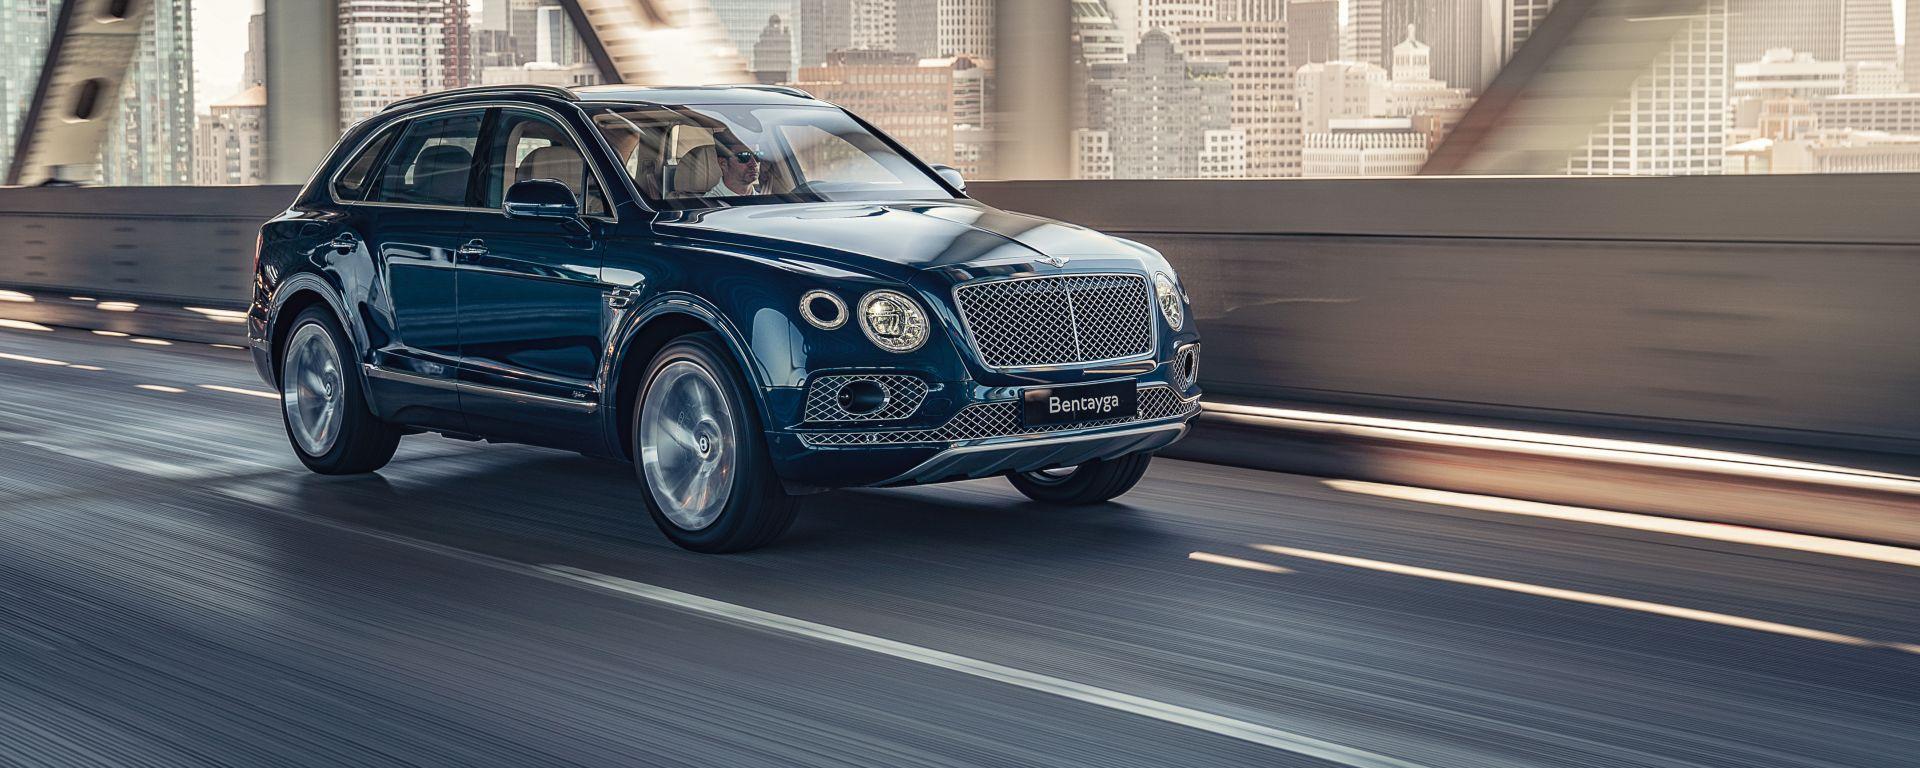 Bentley Bentayga PHEV: vista 3/4 anteriore